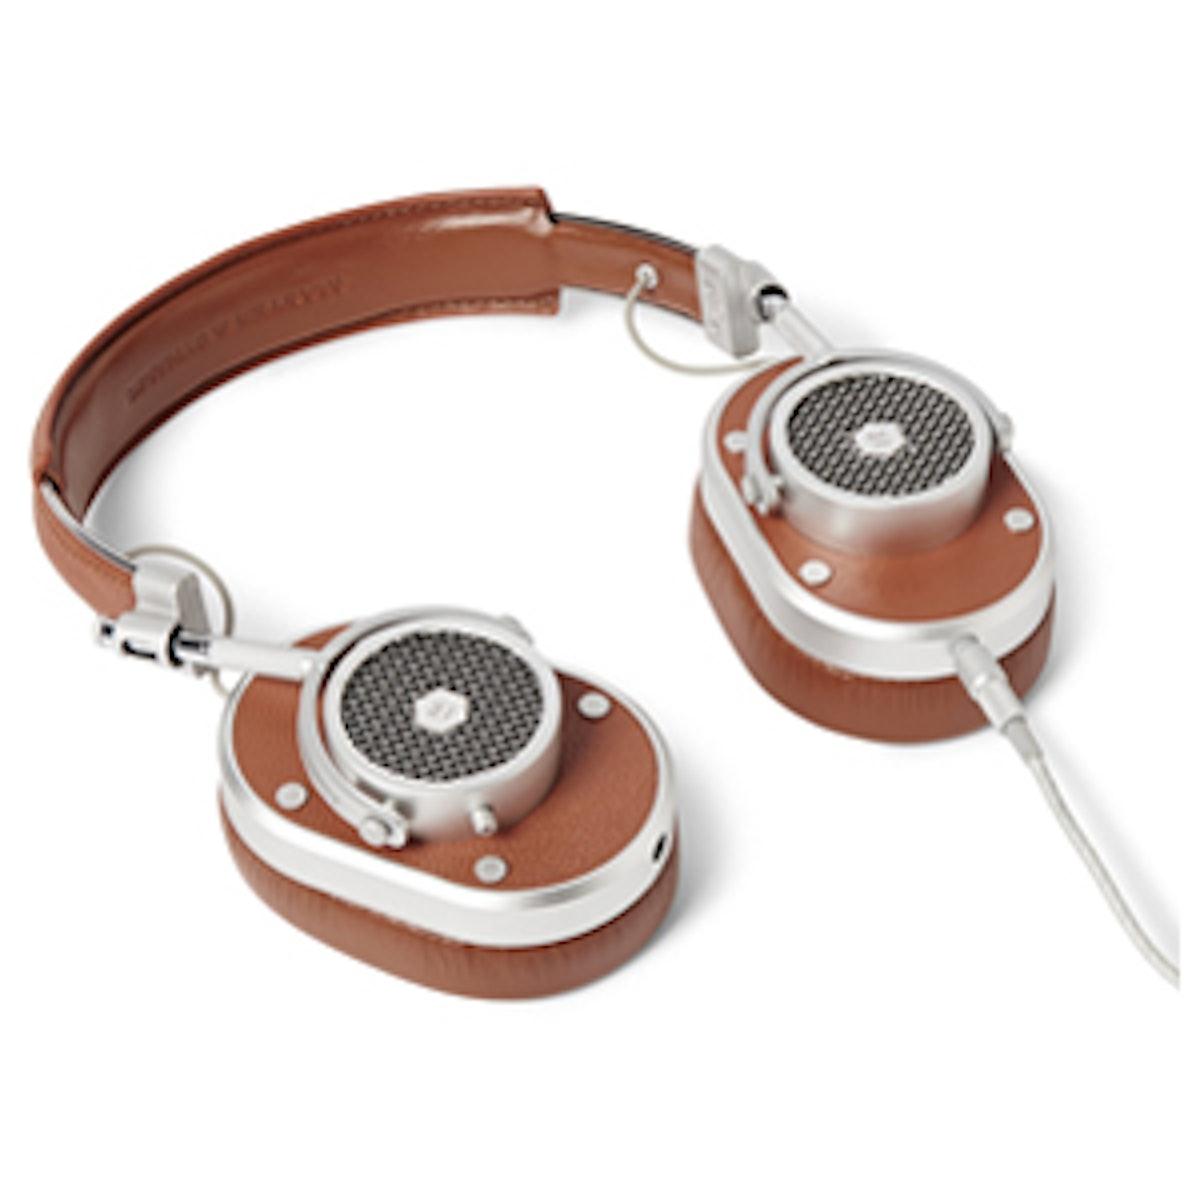 Leather Over-Ear Headphones